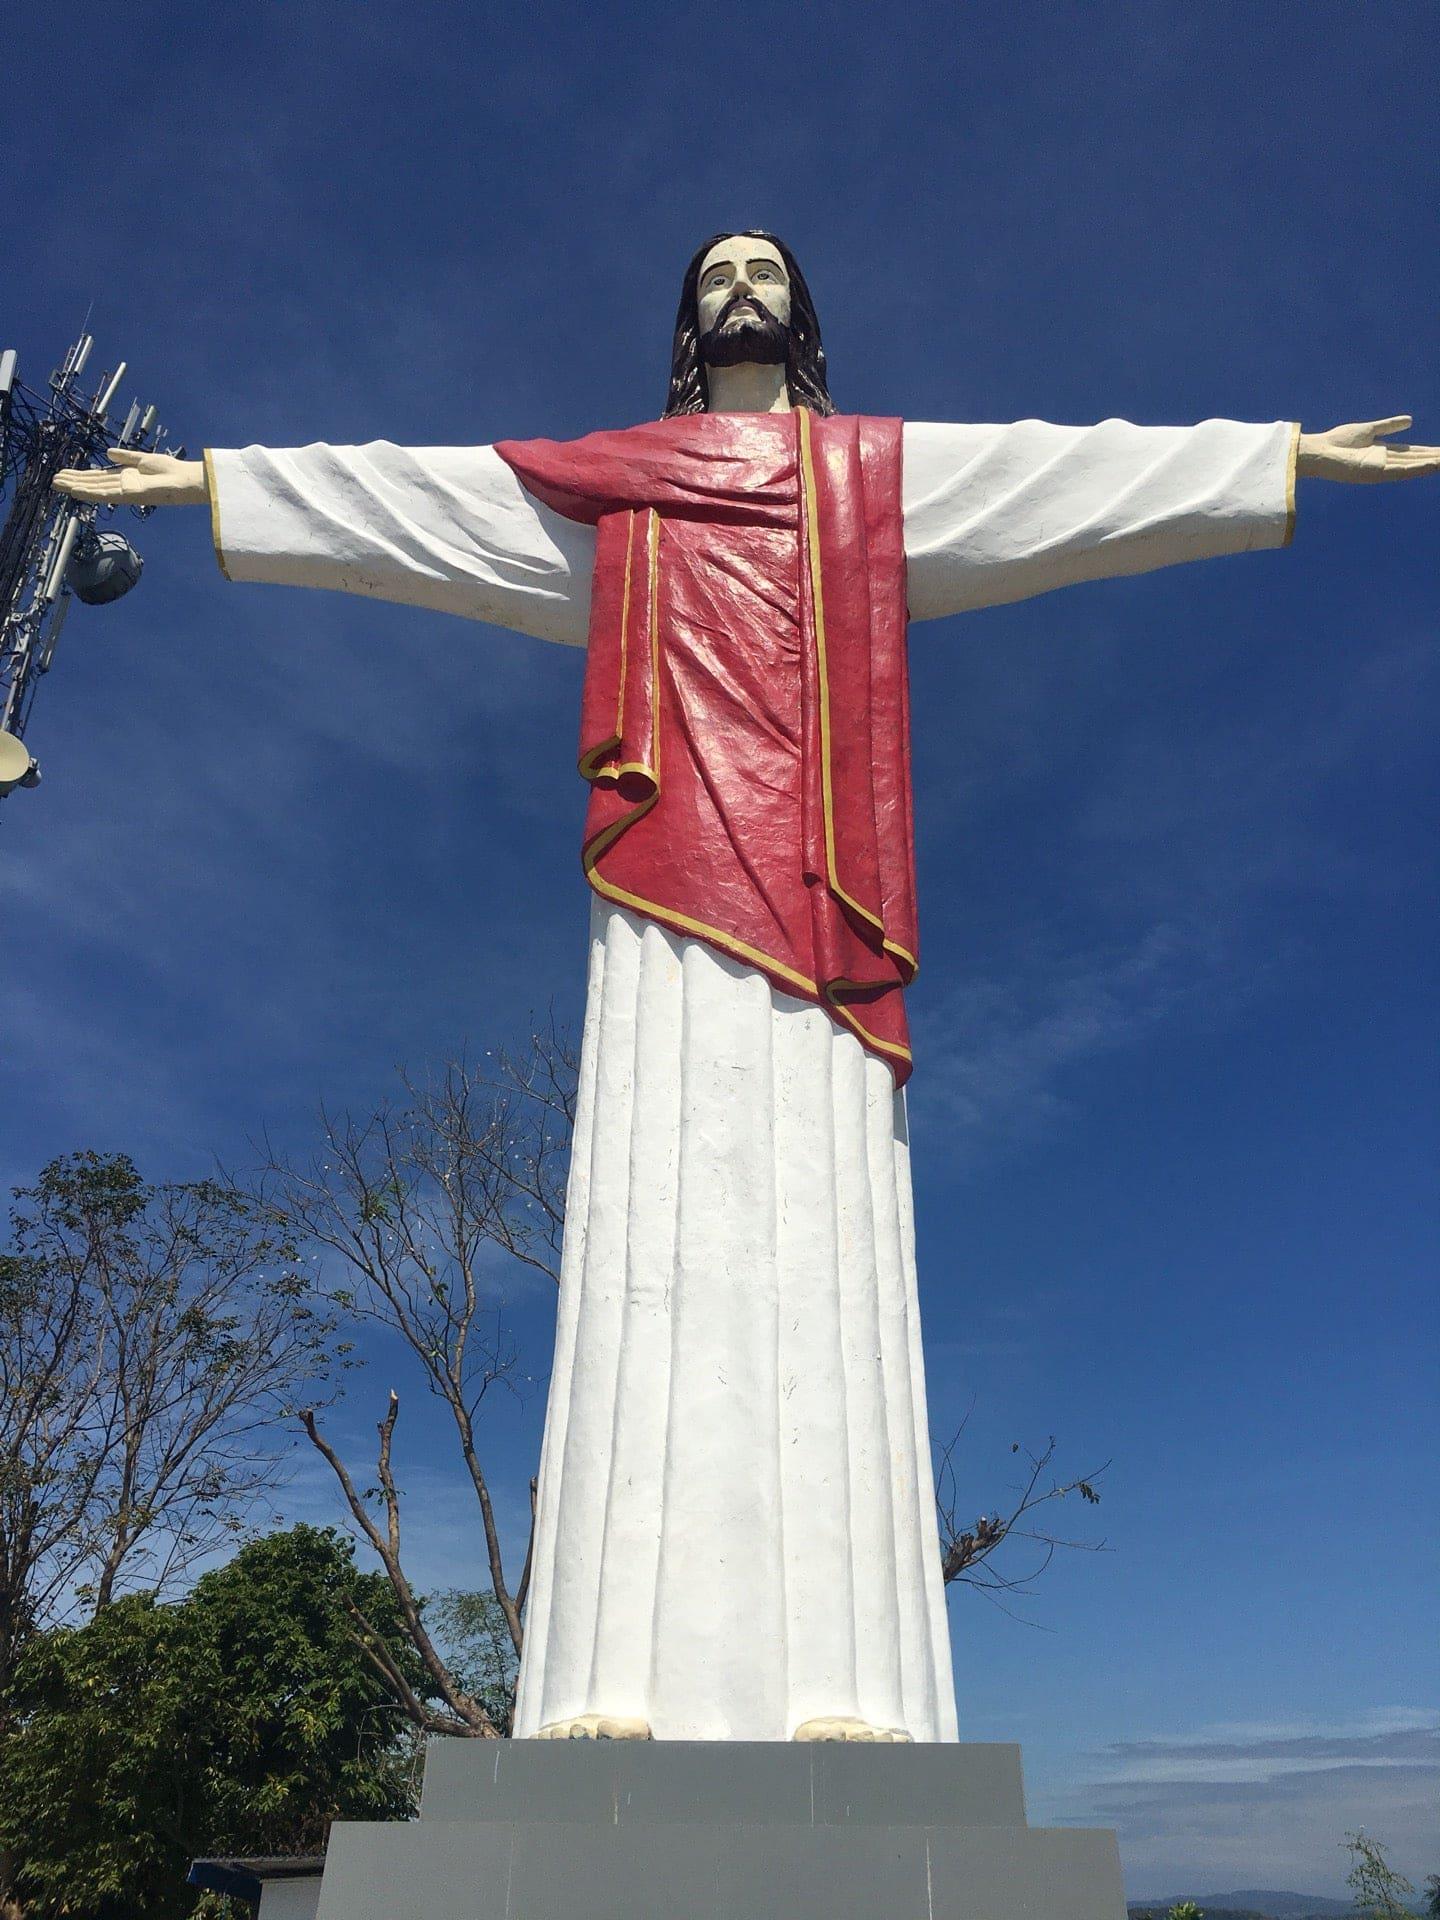 things to do in La Union, La Union tourist spots, Christ the Redeemer Statue,